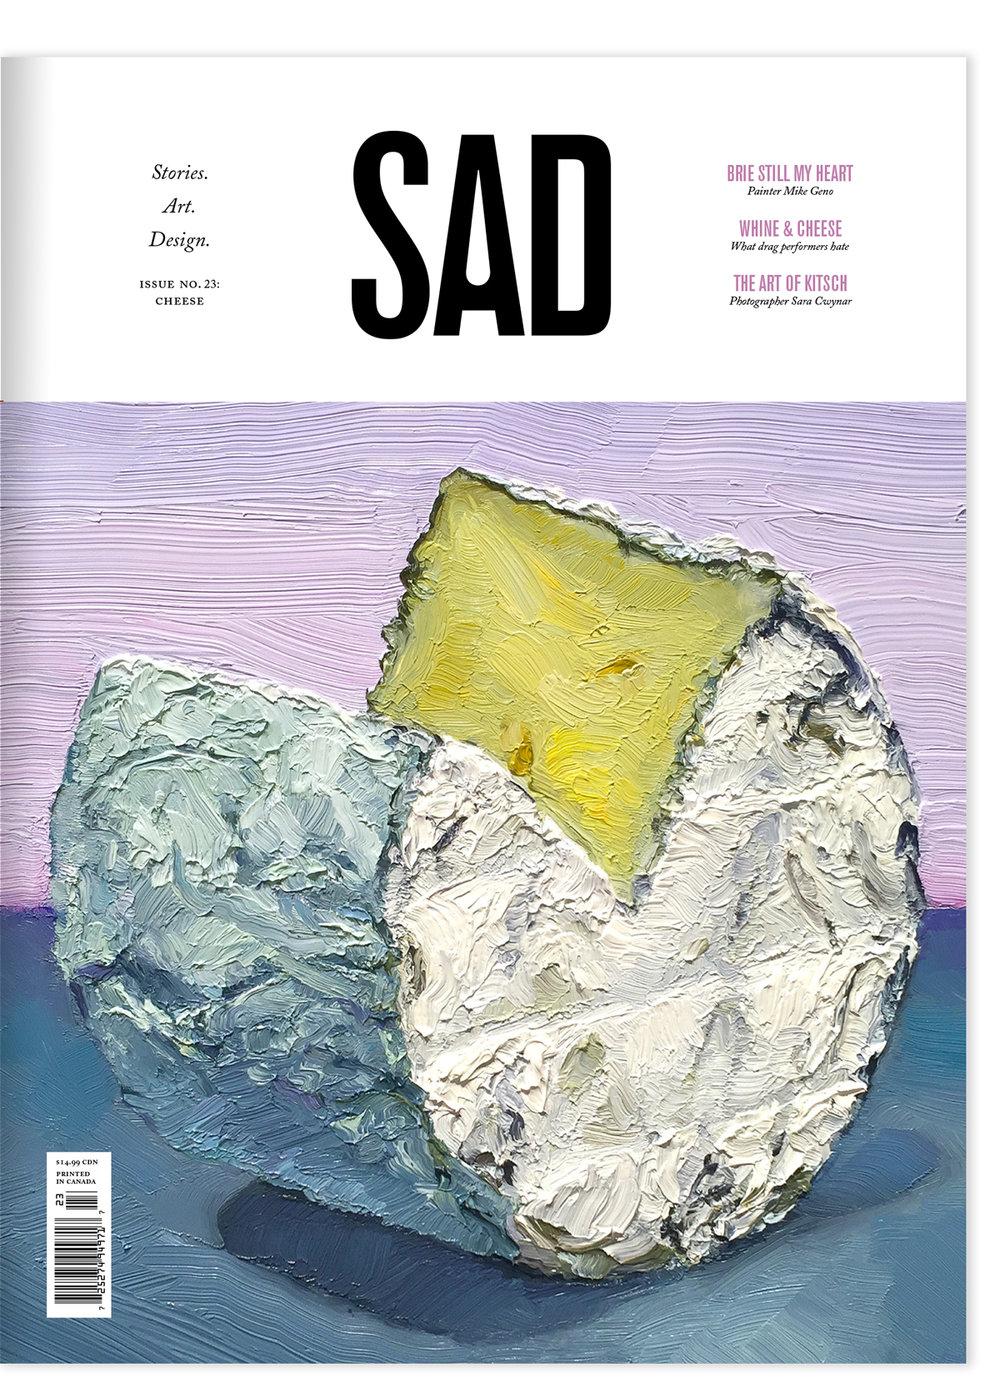 SAD MAG Issue No. 23: Cheese